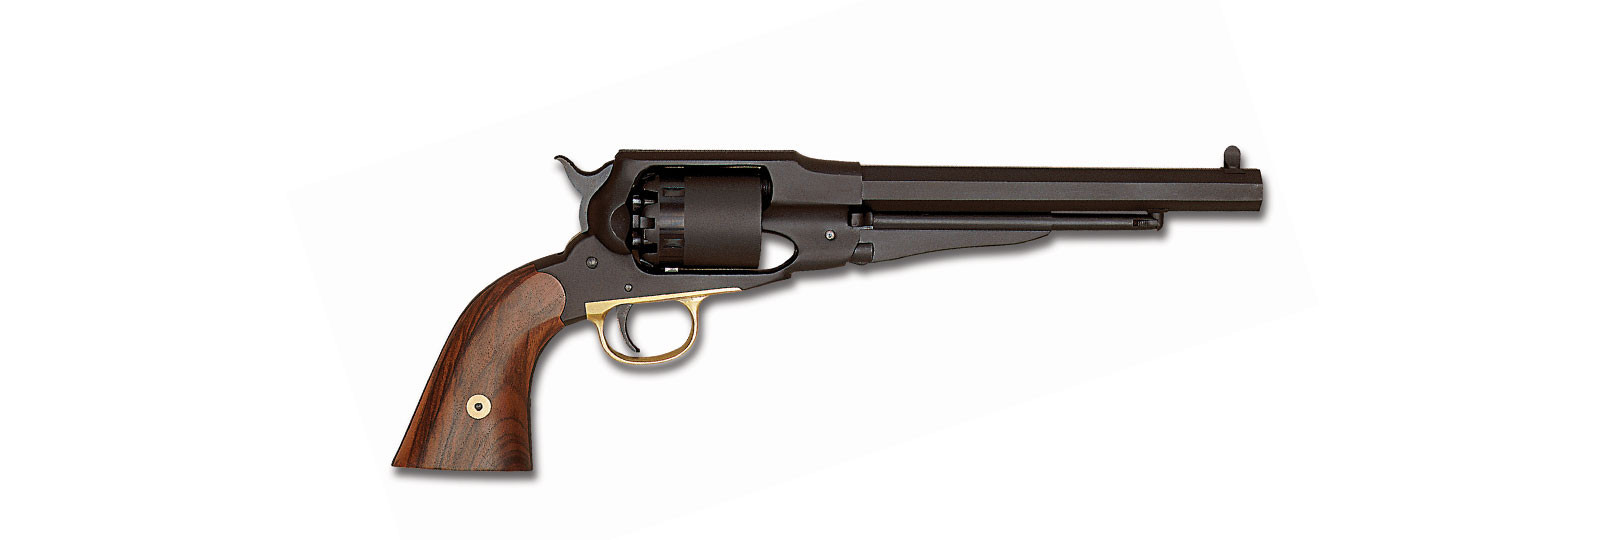 "Remington Pattern Revolver ""PEDERSOLI TARGET"""